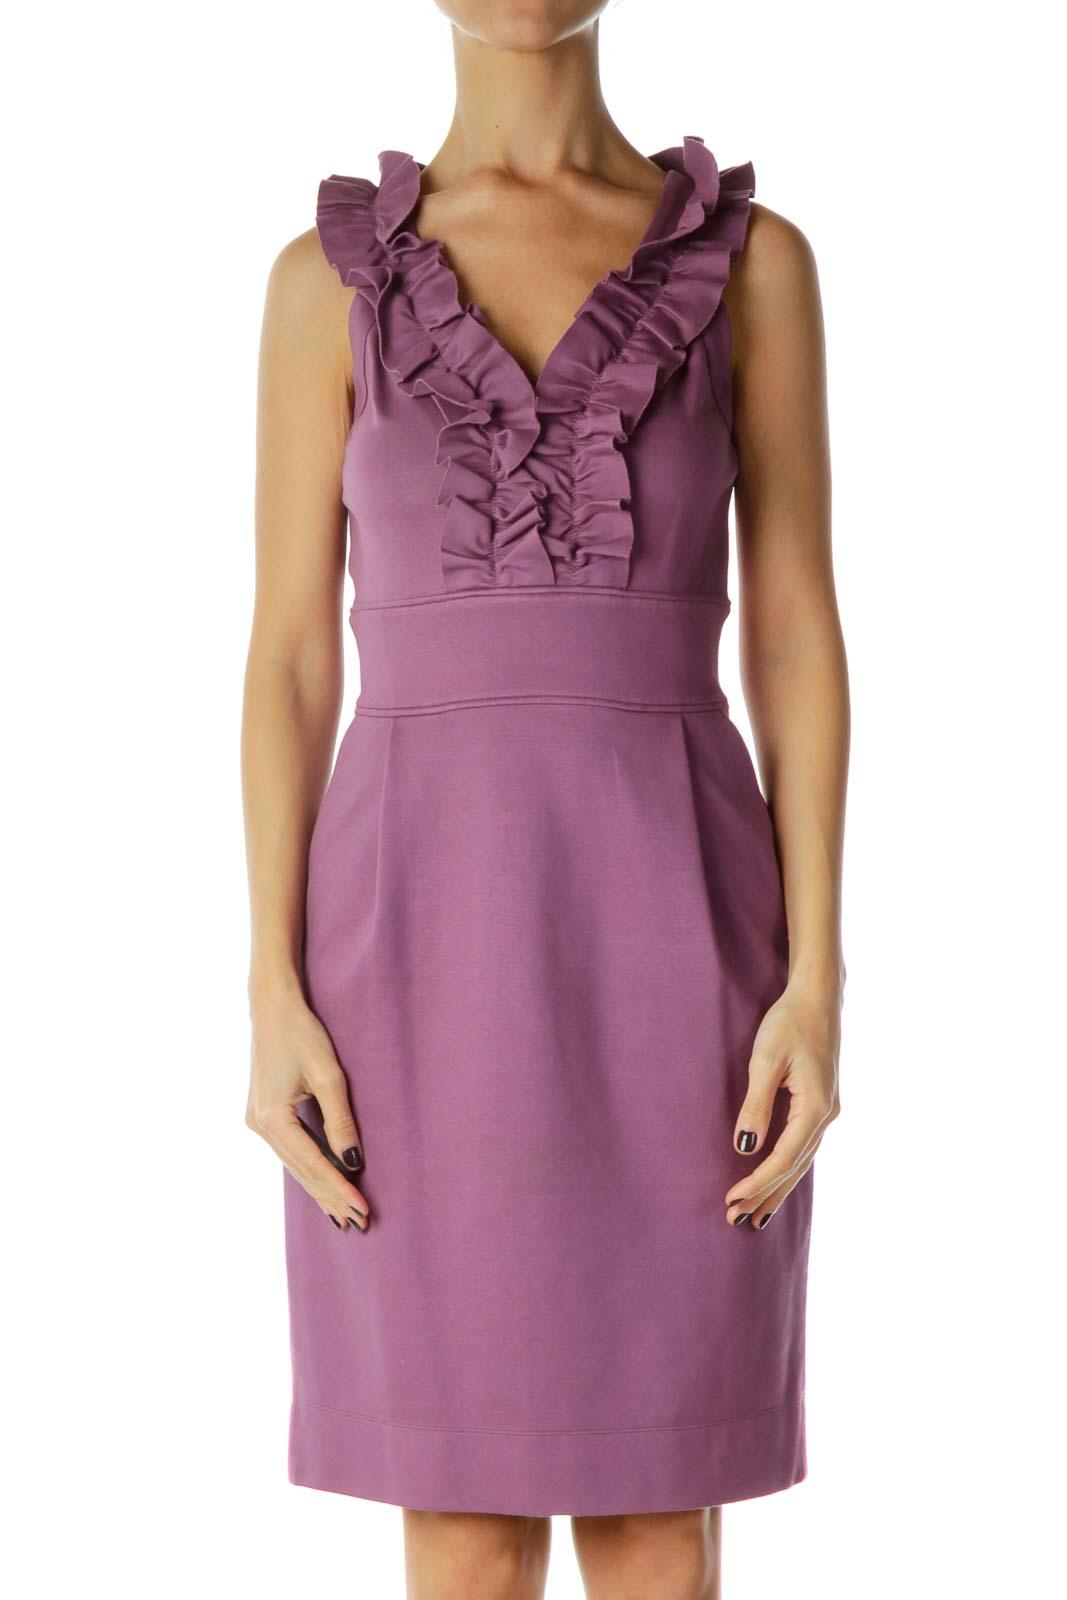 Purple Ruffled Work Dress